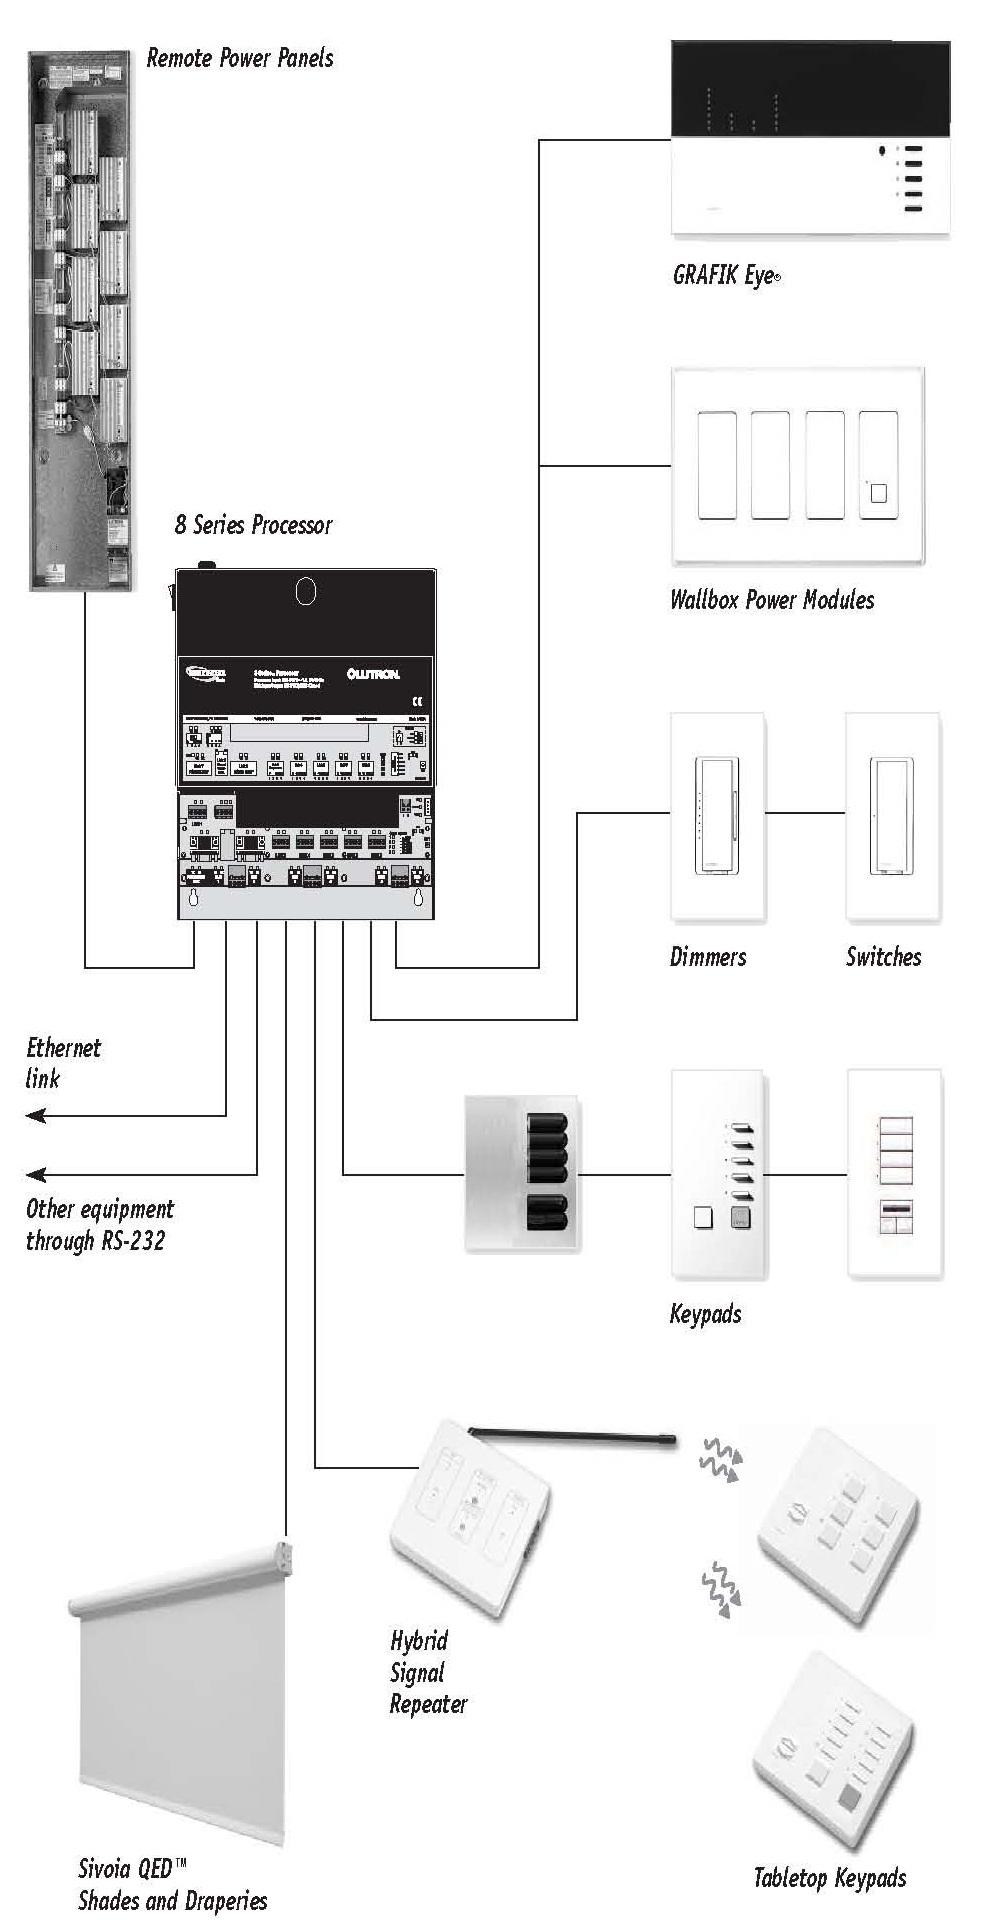 hwi智能照明控制系统